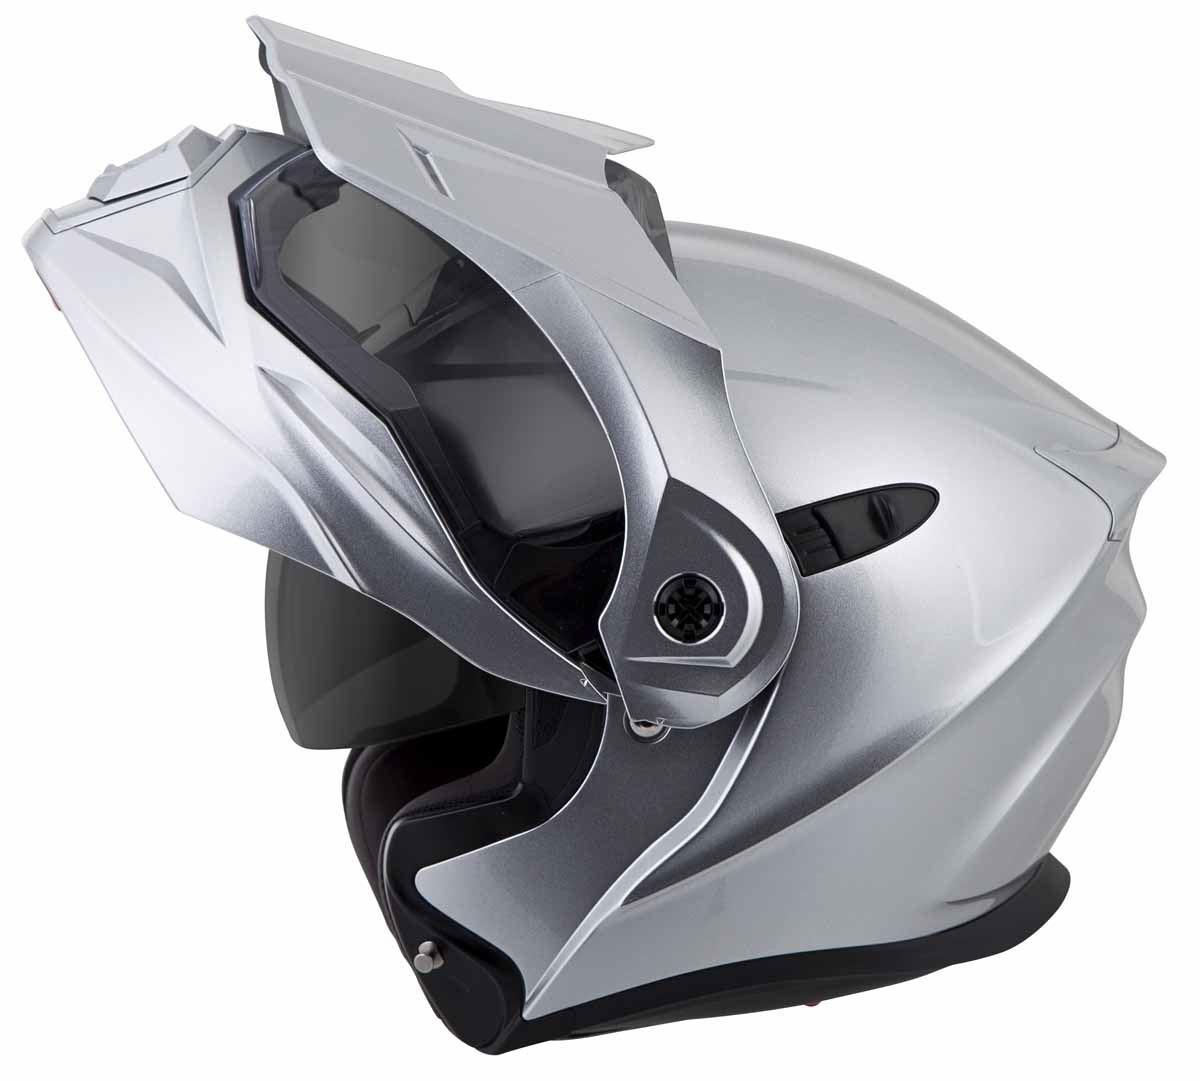 Scorpion-EXO-AT950-Helmet-Flip-Up-Modular-Dual-Sport-Adventure-ADV-DOT-XS-3XL miniature 19